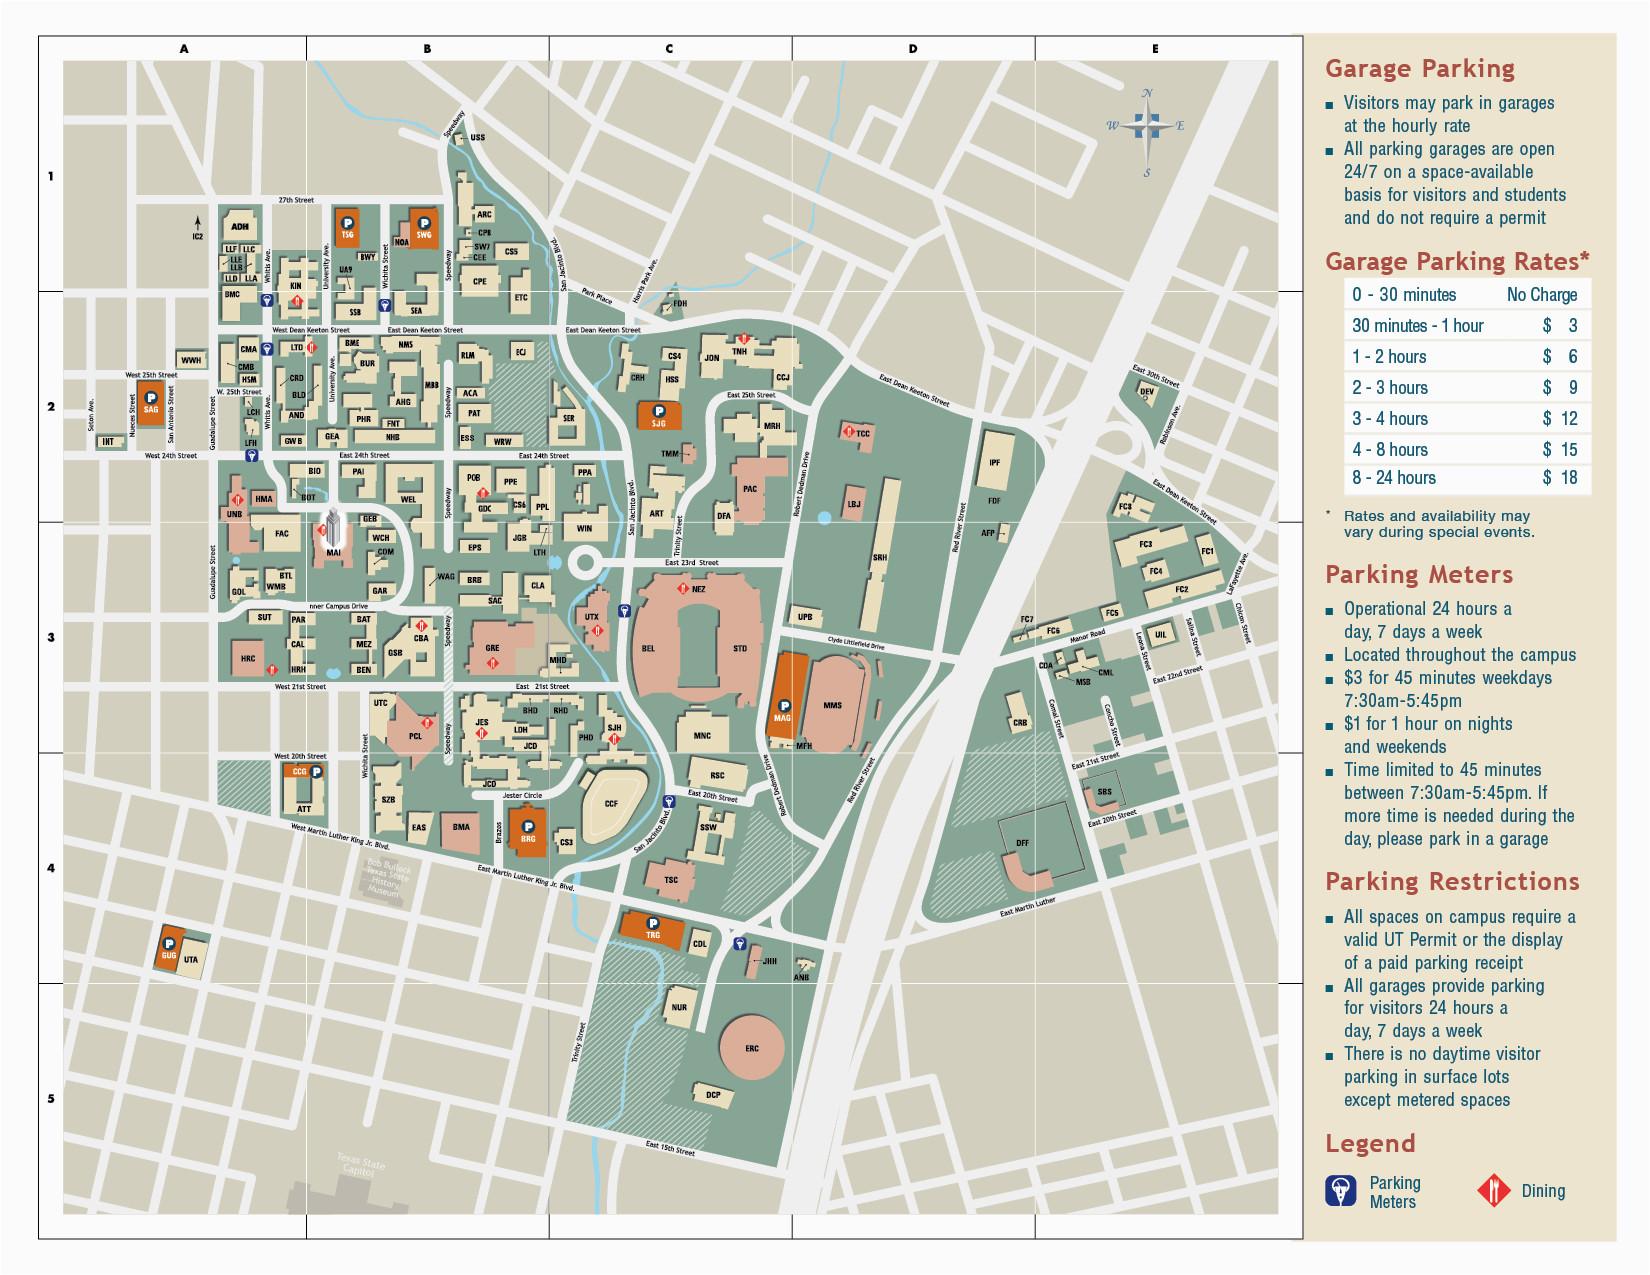 university of texas parking map business ideas 2013